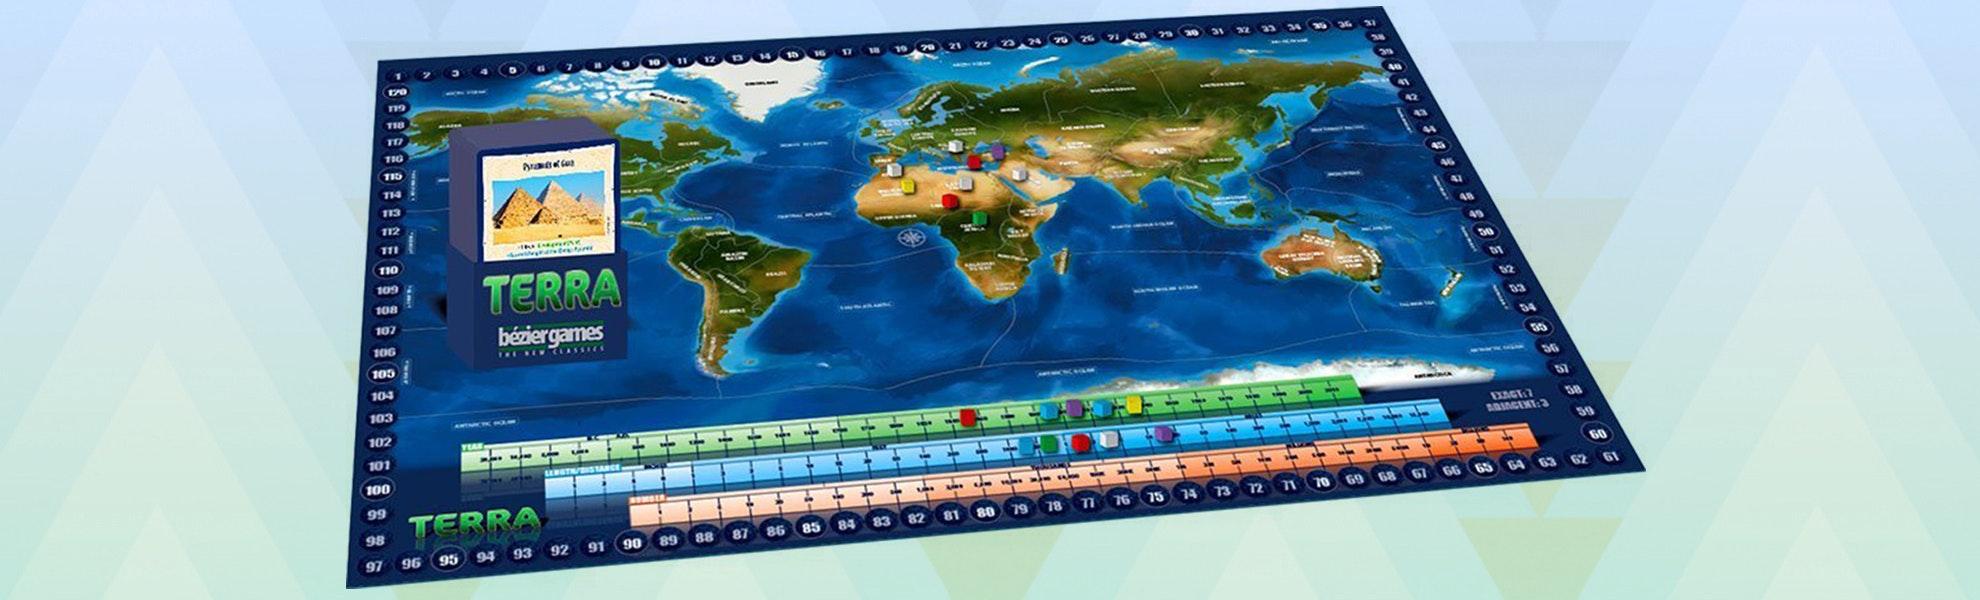 Terra Board Game